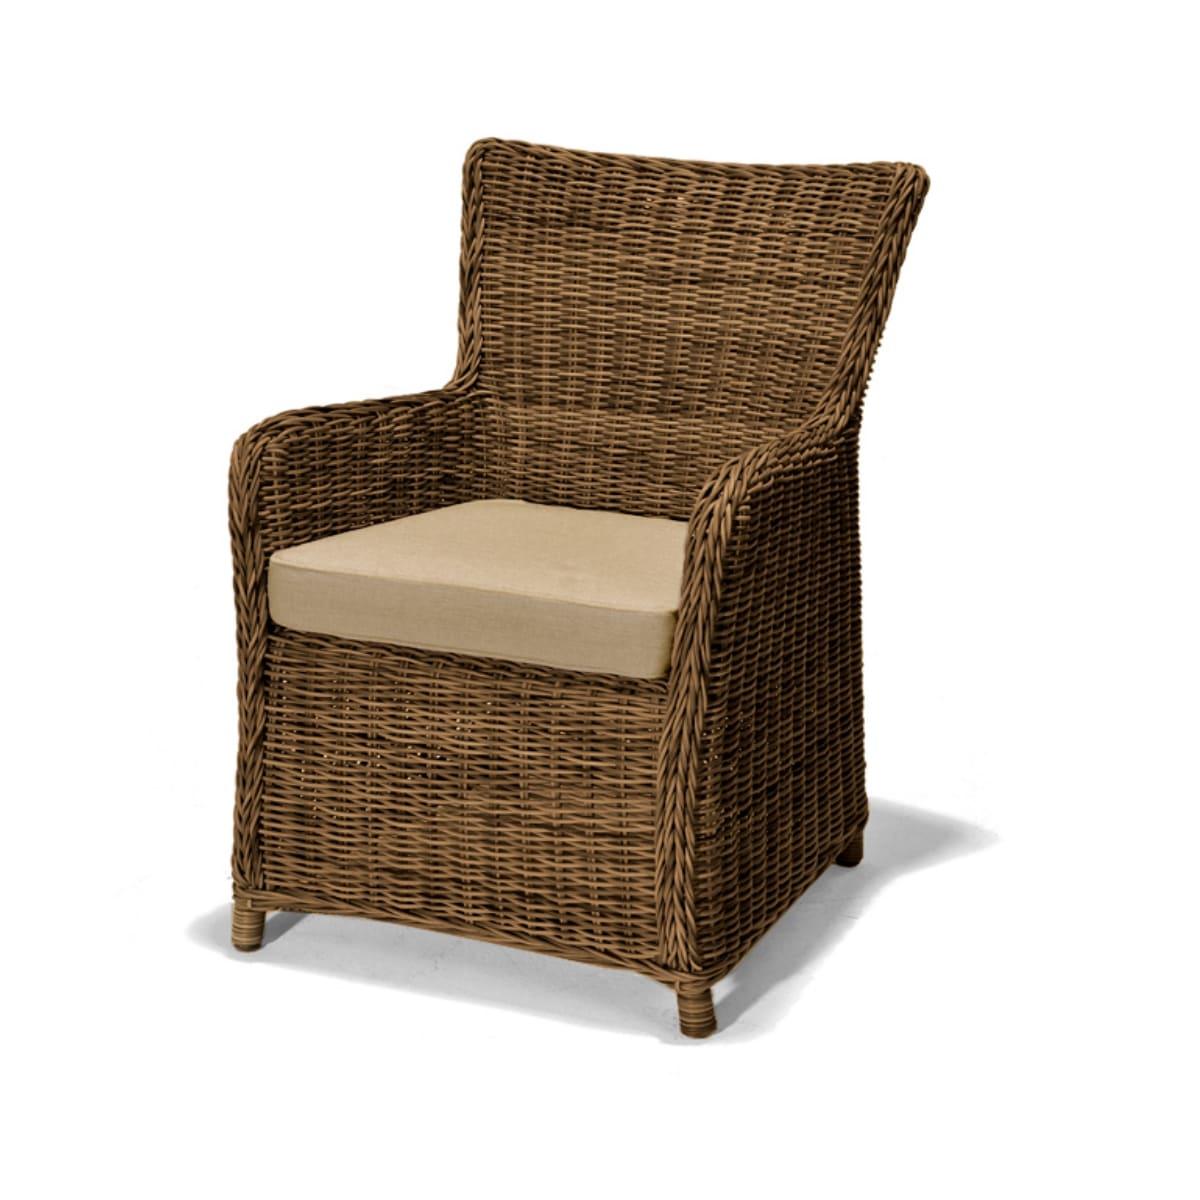 Patio Furniture Tysons Corner Virginia: Vienna 1 Outdoor Patio Furniture Patio Set